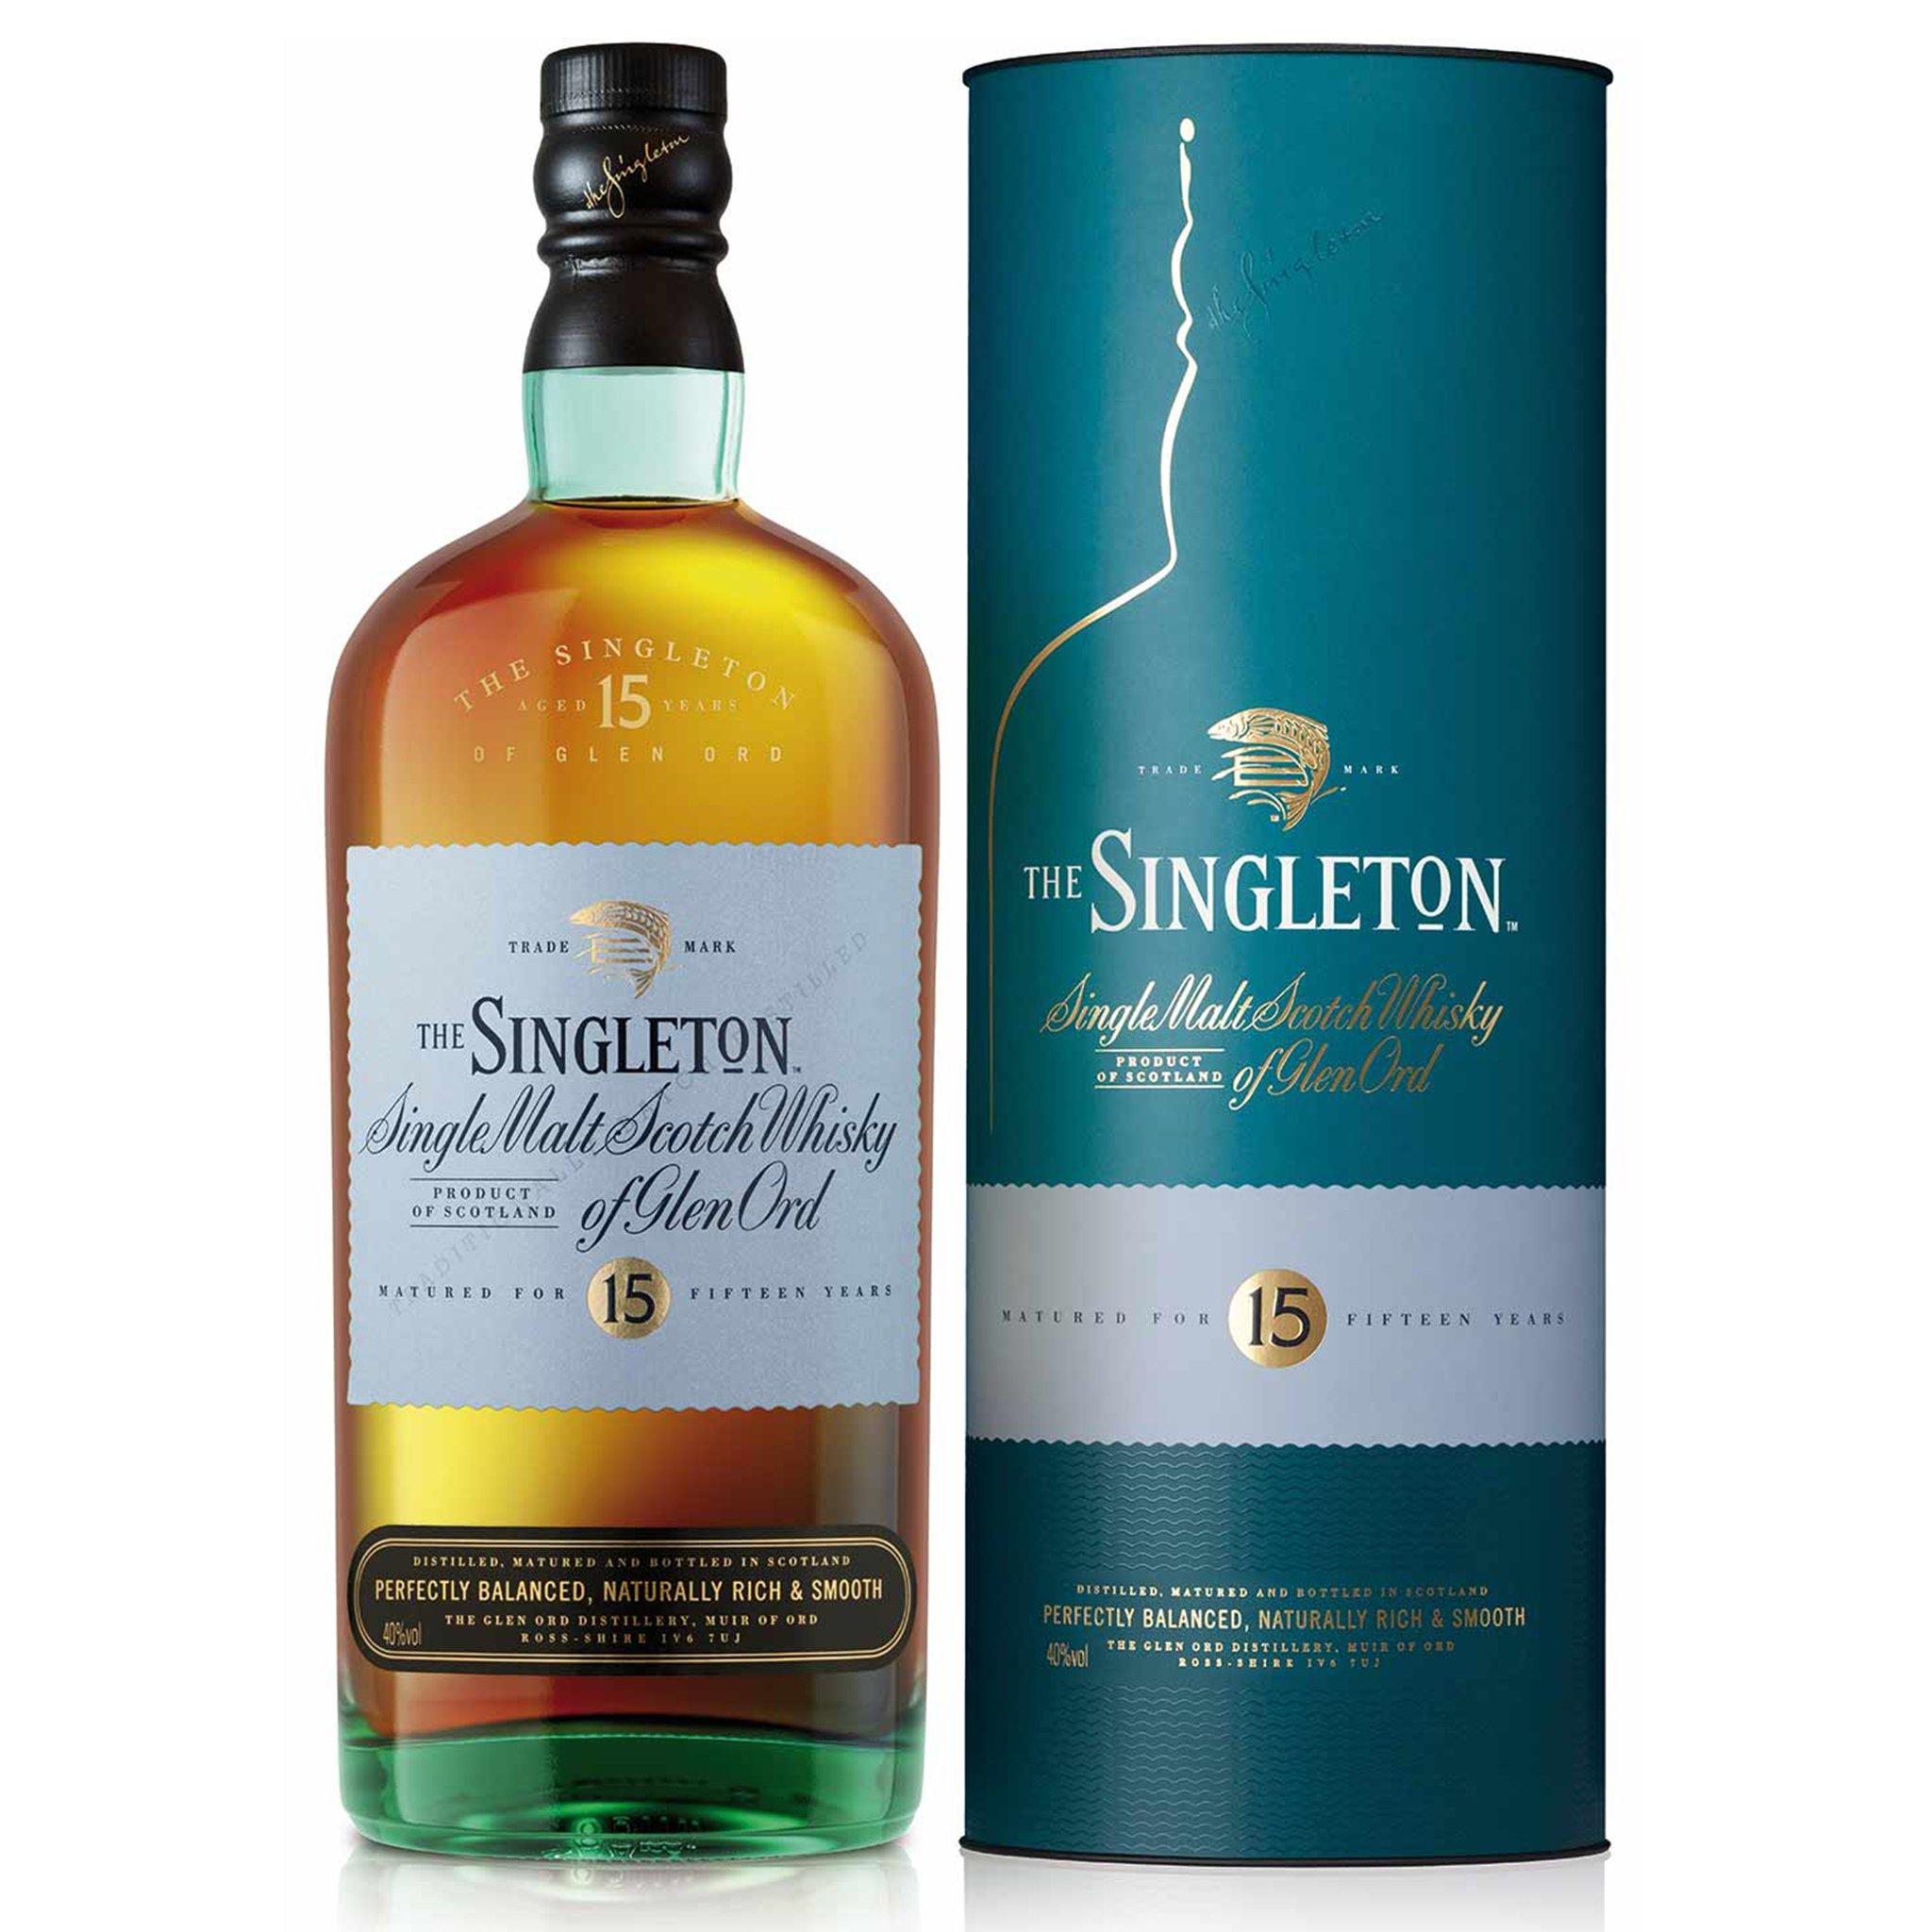 The singleton 15 single malt Scotch whisky of Glen Ord